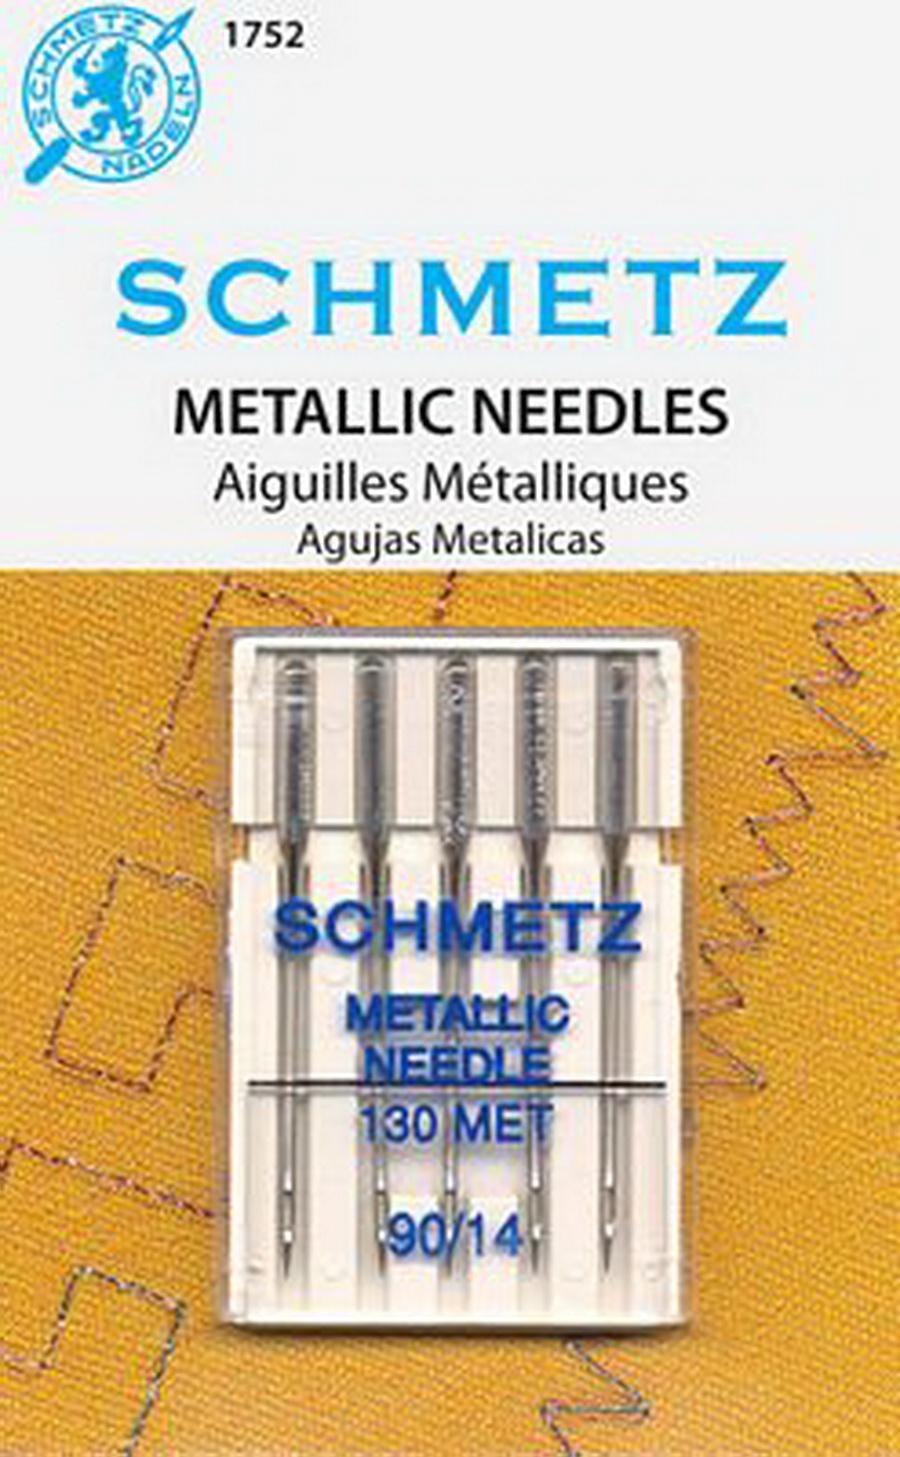 Schmetz Metallic Needles - Size 90/14